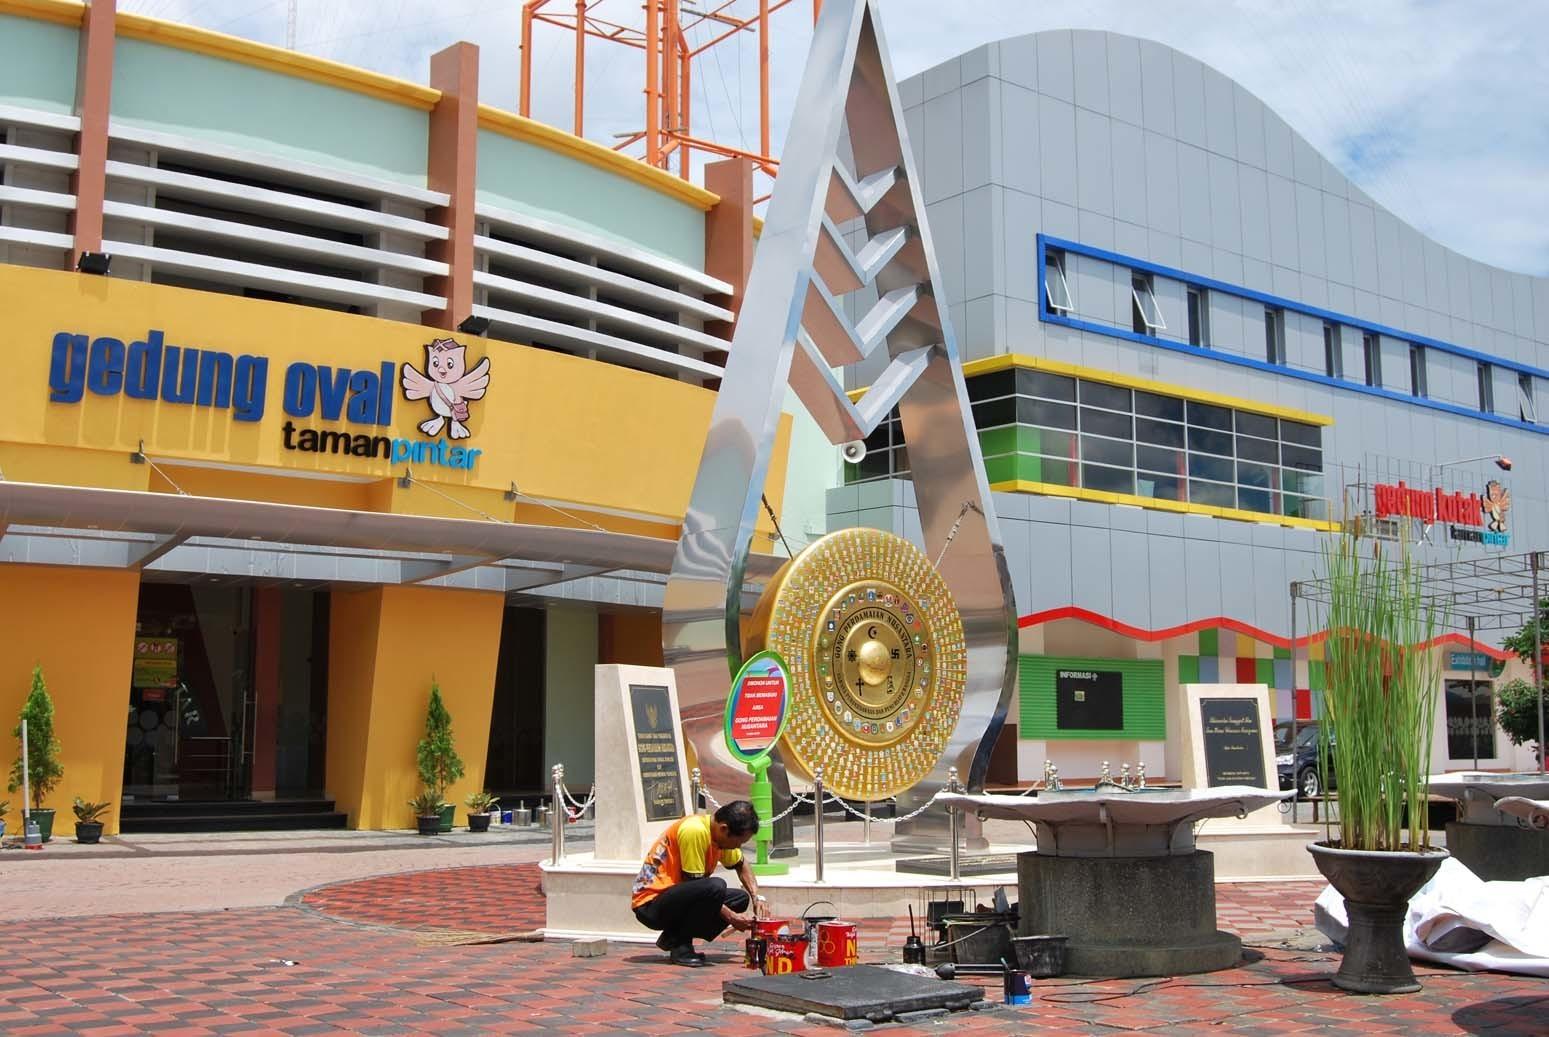 Taman Pintar Yogyakarta Attraction Indonesia Copy Siska Pratiwi Kota